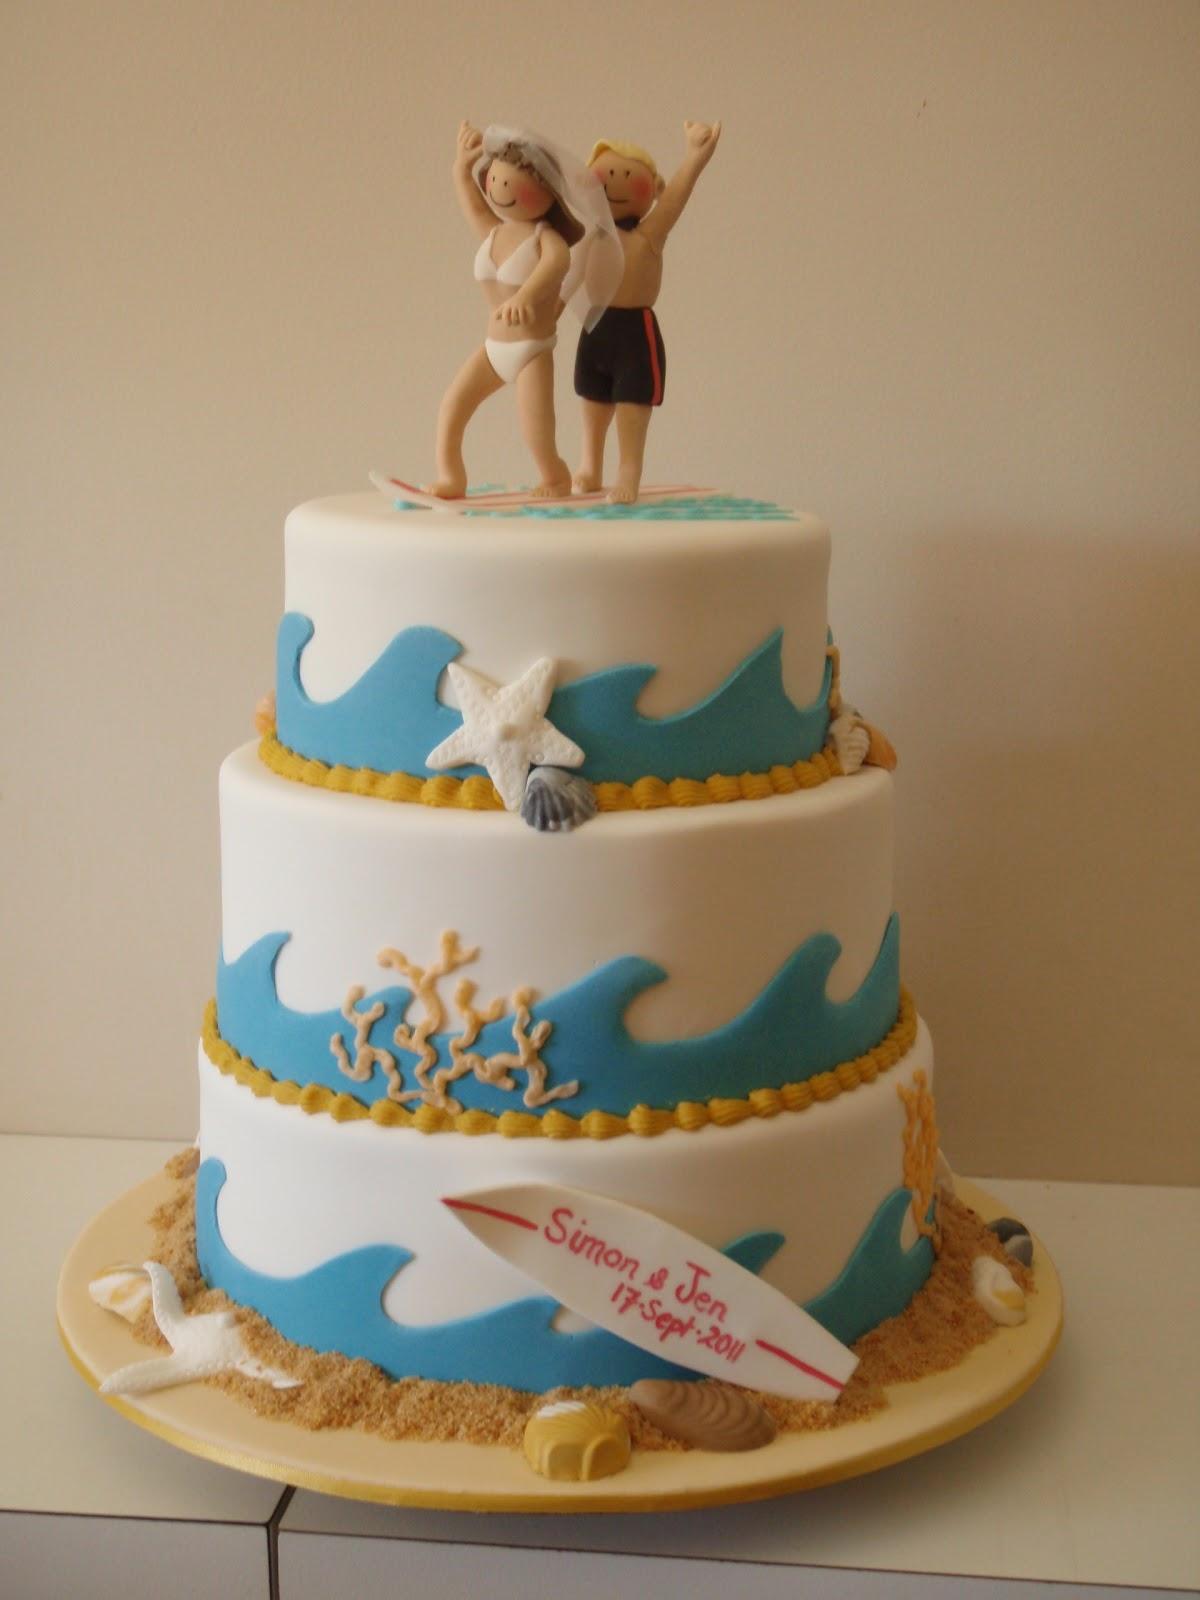 Pin Surfing Surfboard Surfer Wedding Cake Topper Hawaii Dermatology Cake On Pinterest